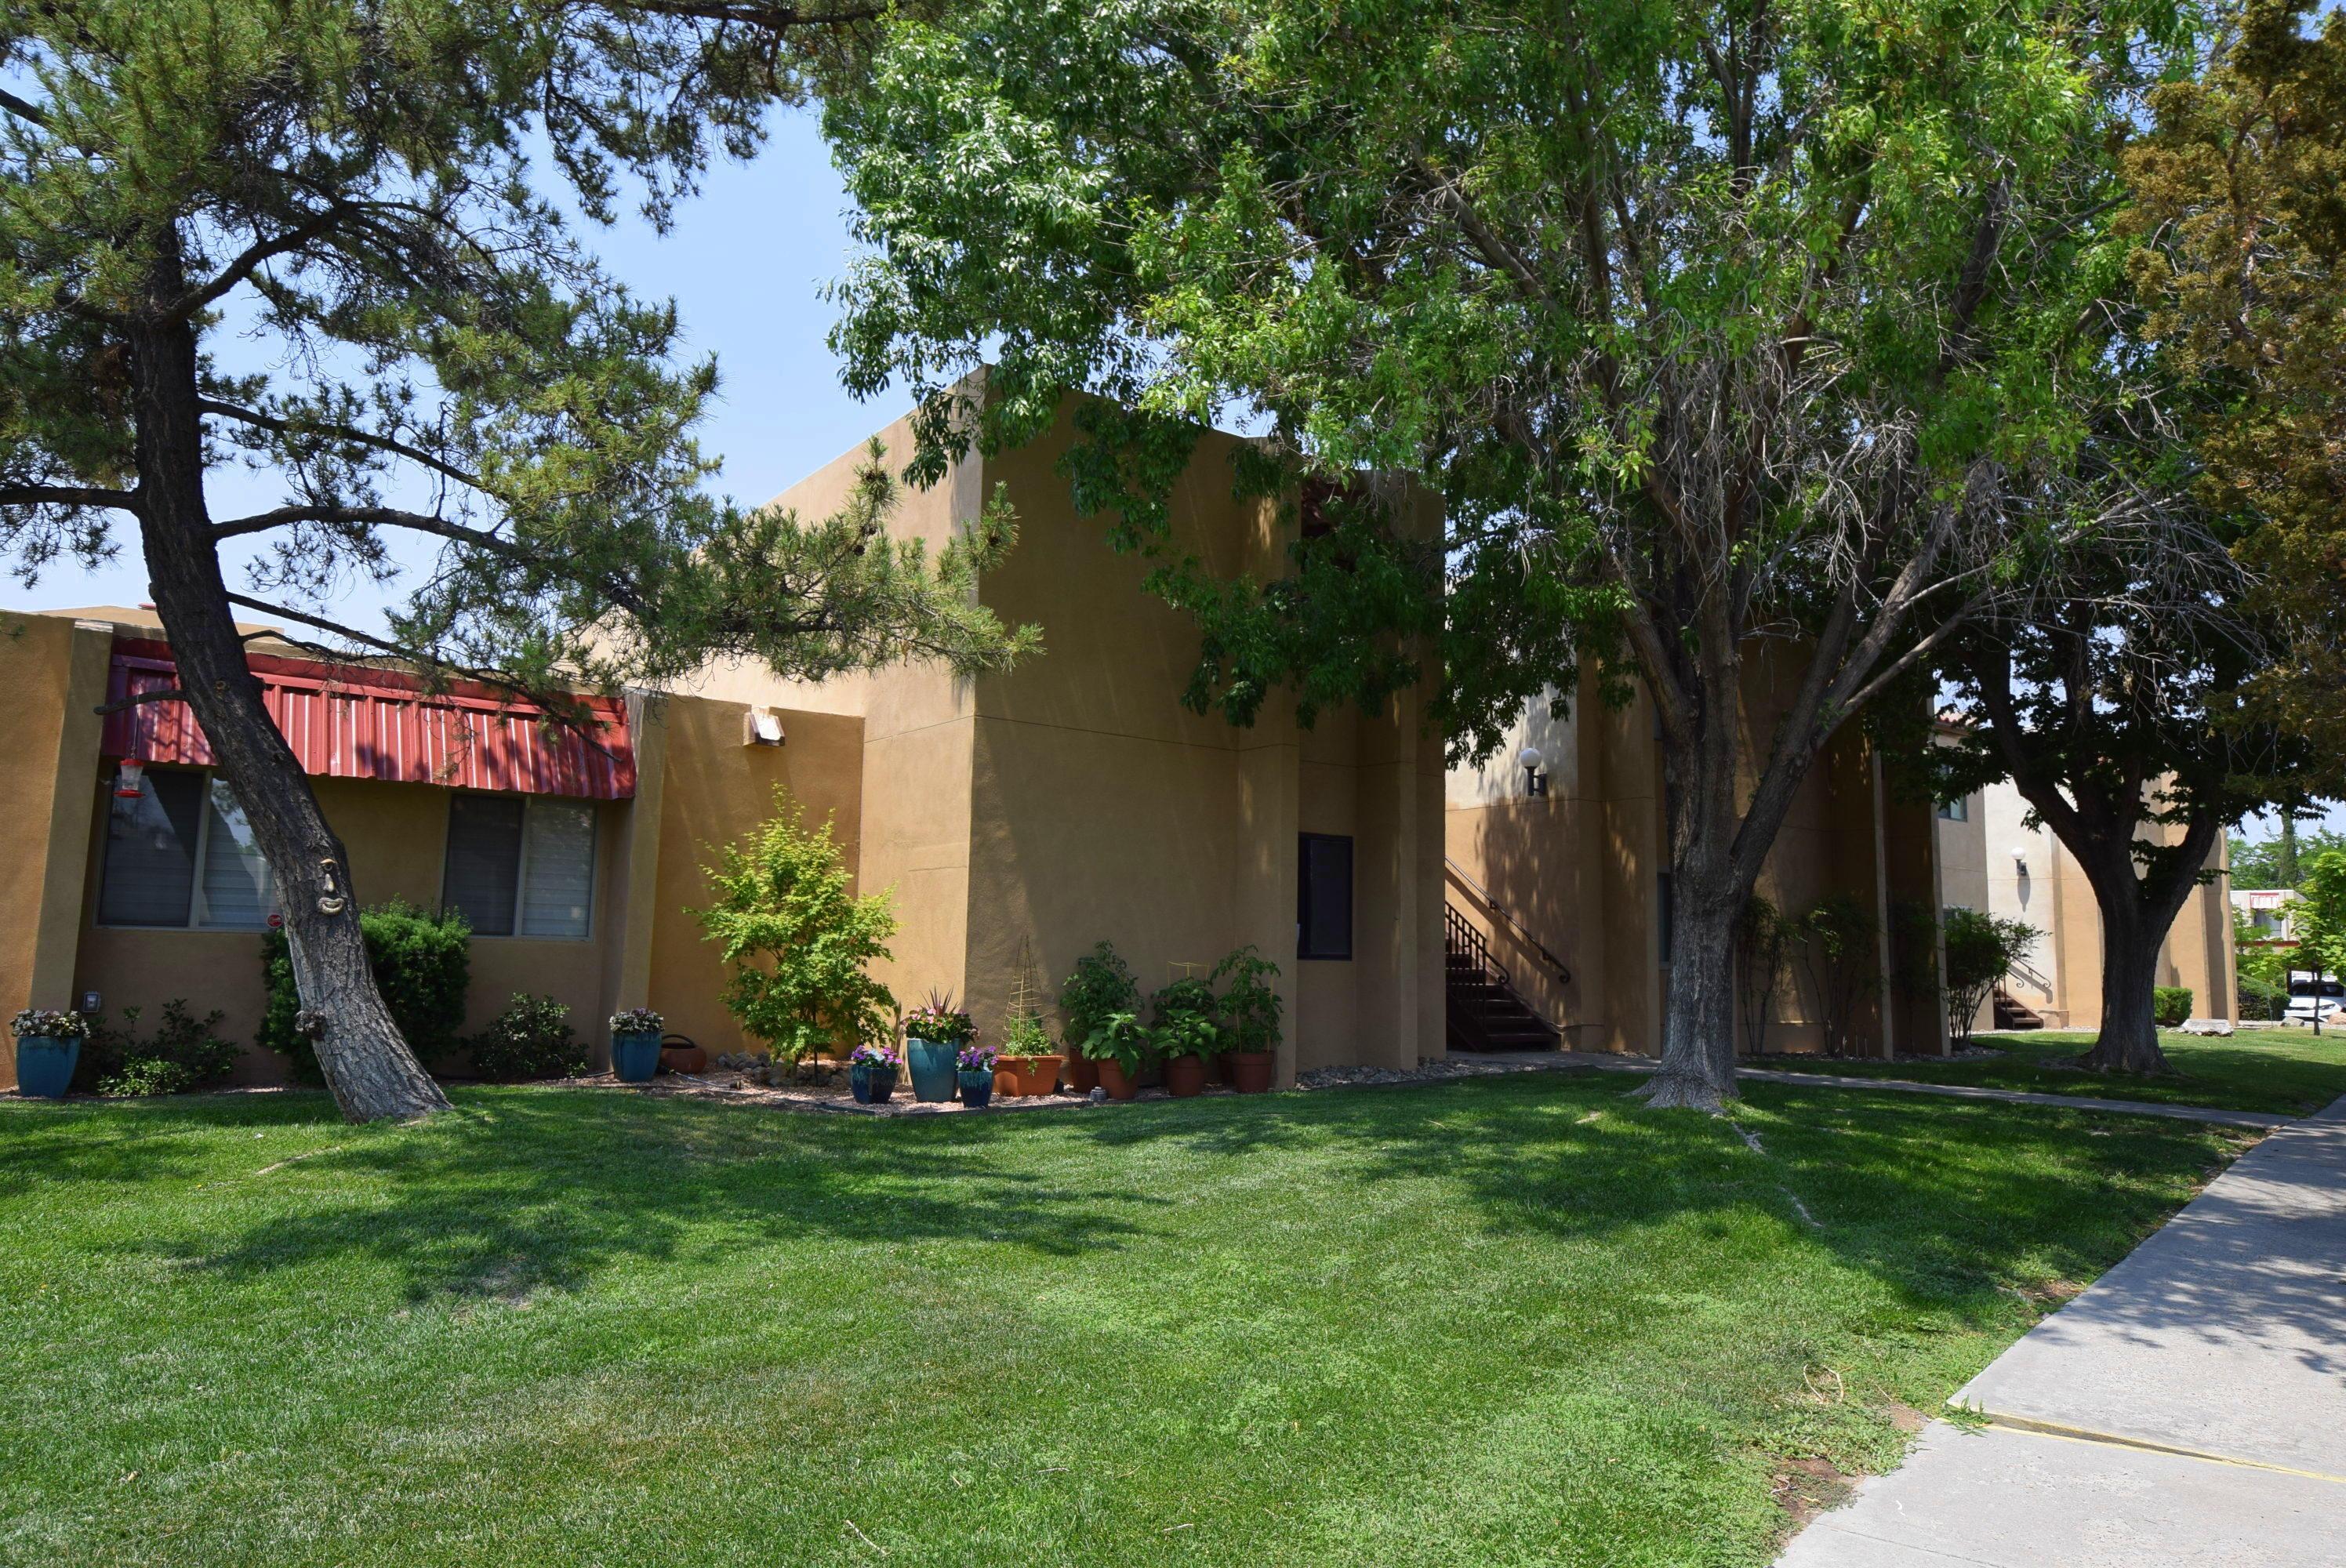 907 Country Club Drive Unit D, Albuquerque NM 87124